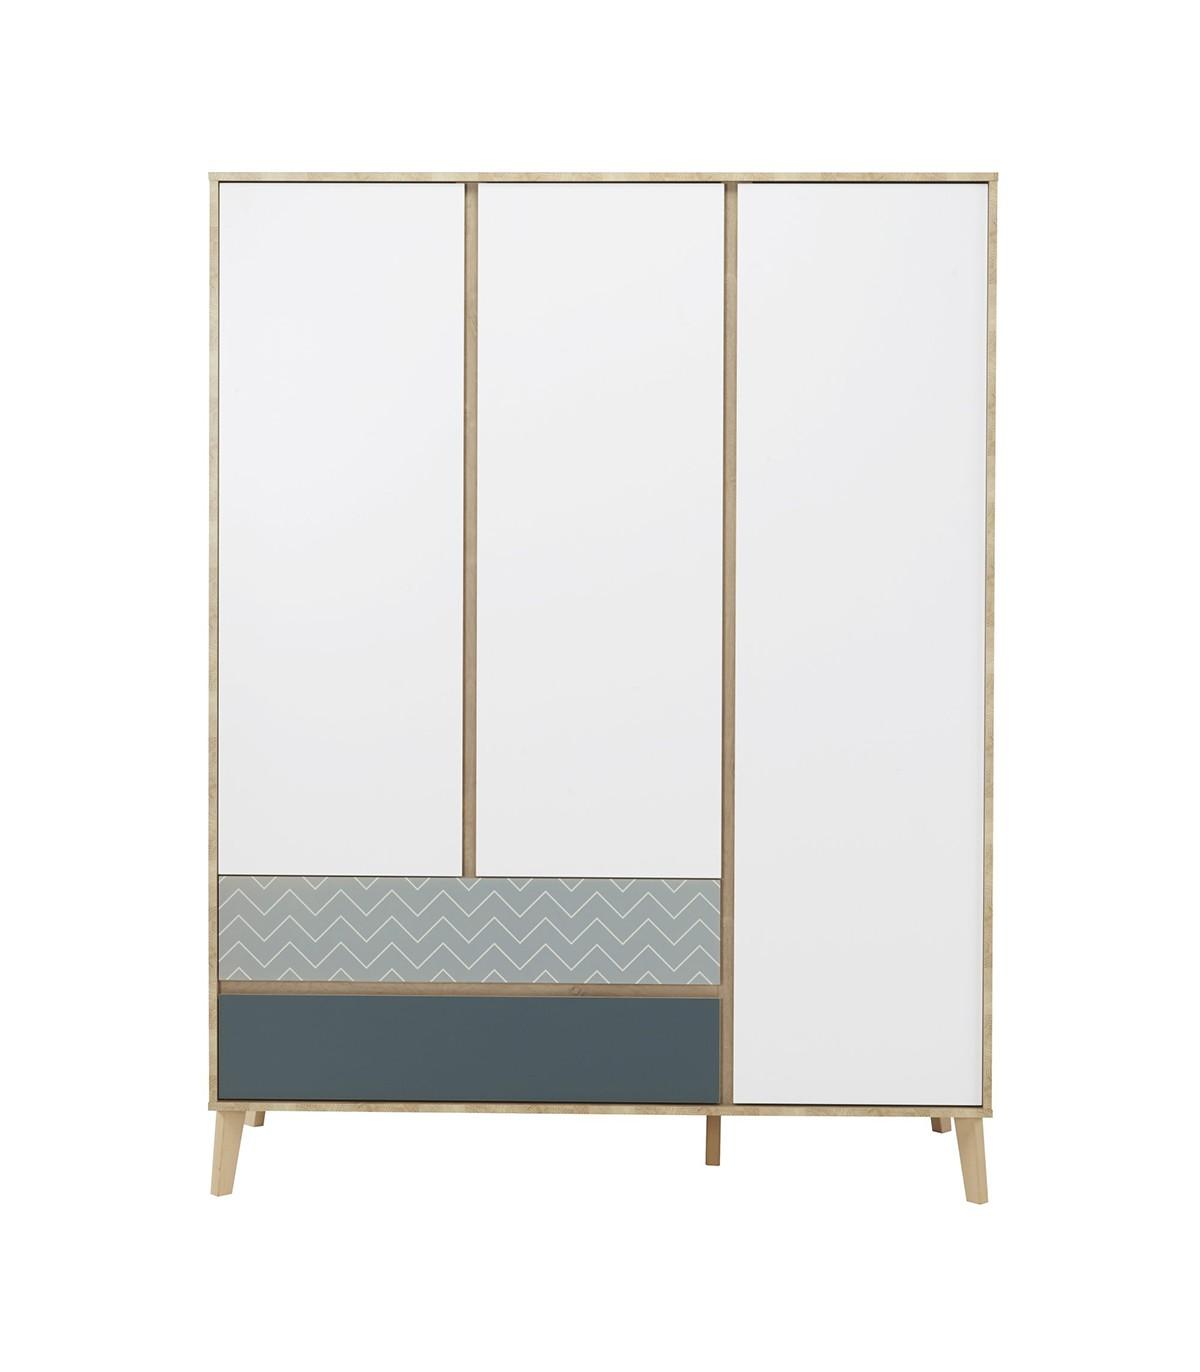 Armoire 3 portes 2 tiroirs Enfant Blanc et bleu 153x200